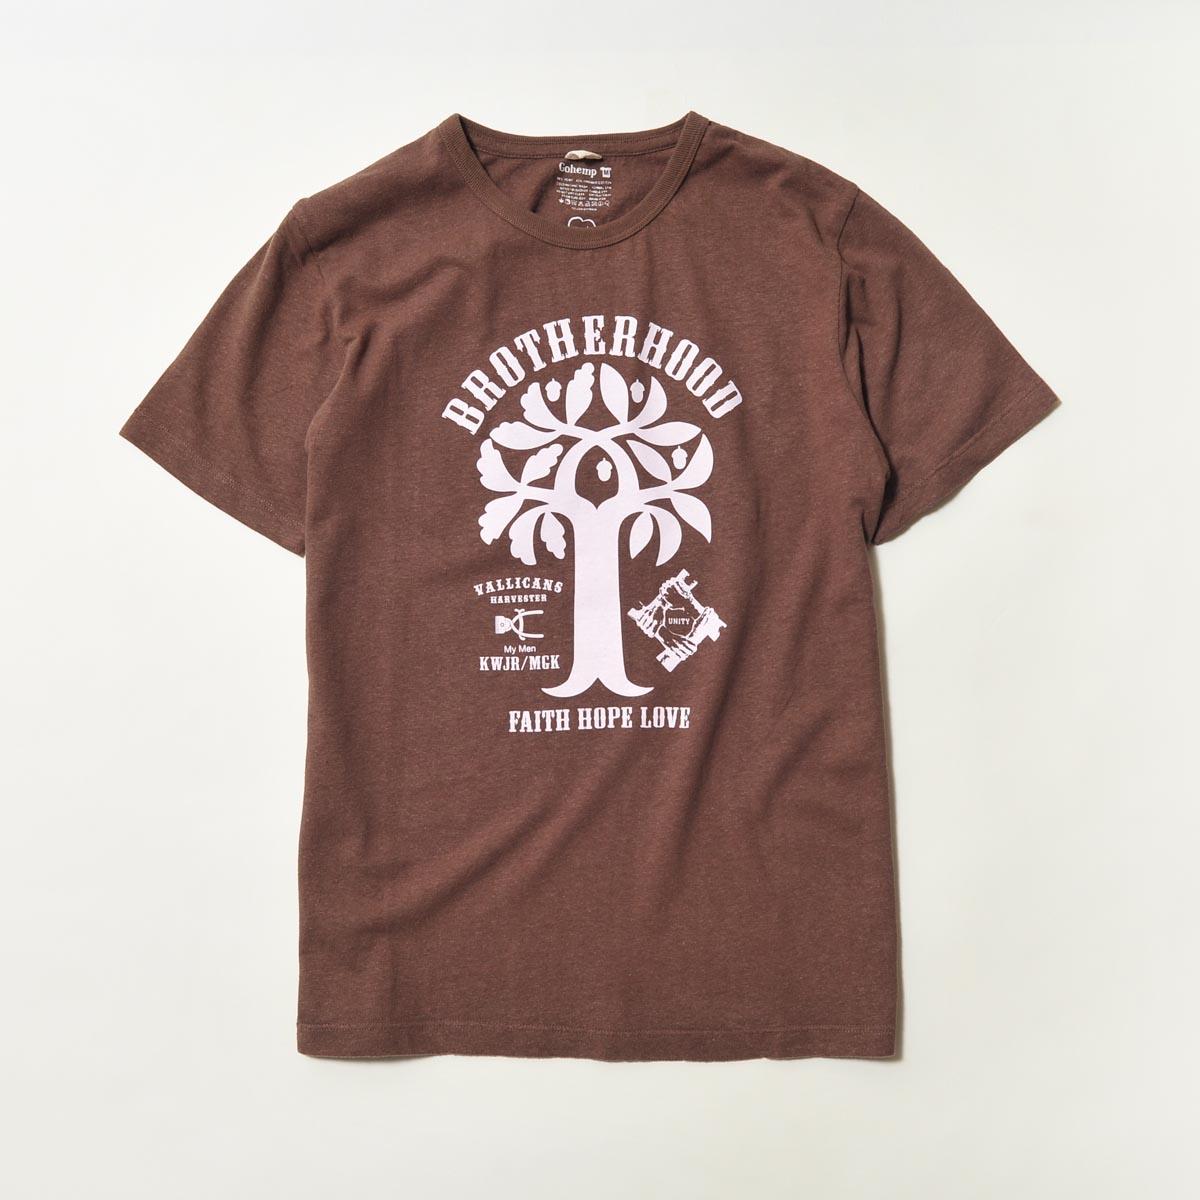 BROTHERHOOD Tシャツ_a0152253_15565658.jpg